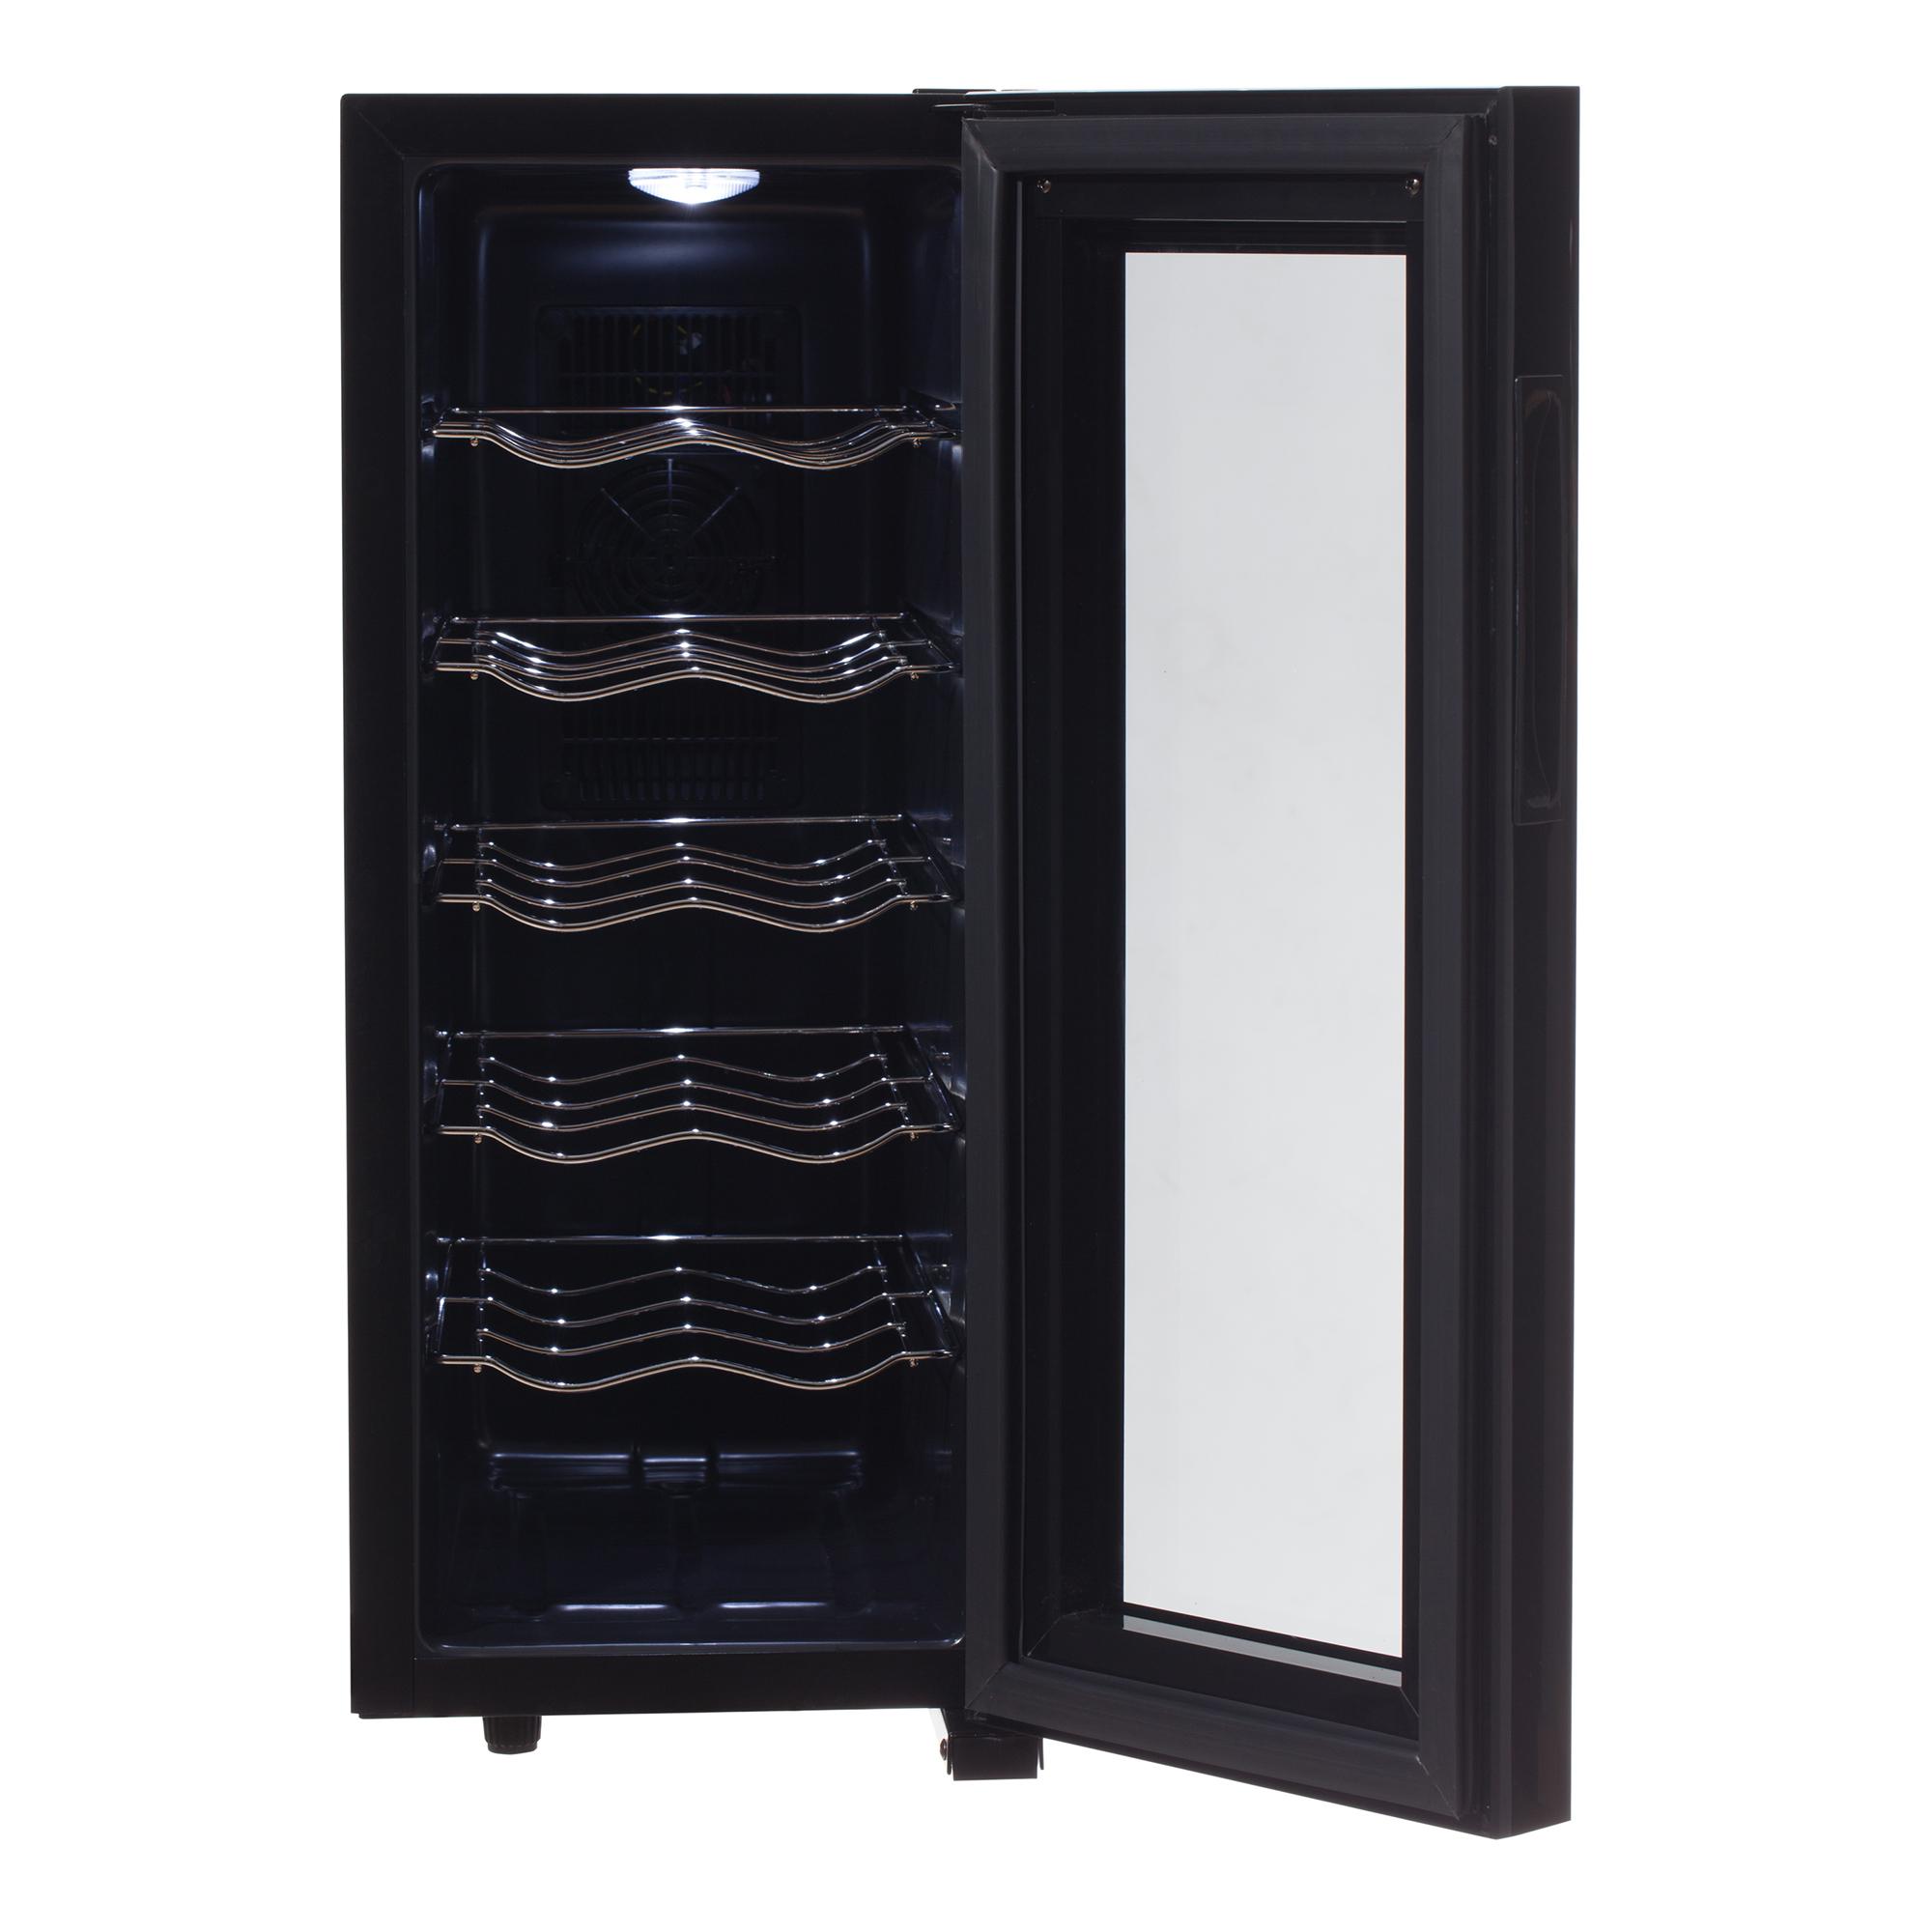 CAMRY CR8068 Vinoteca de 12 Botellas, Acero Inoxidable, Regulador de Temperatura 12 a 18 °C, Control Táctil, Iluminación Interior, Estrecha, Alta, 50W